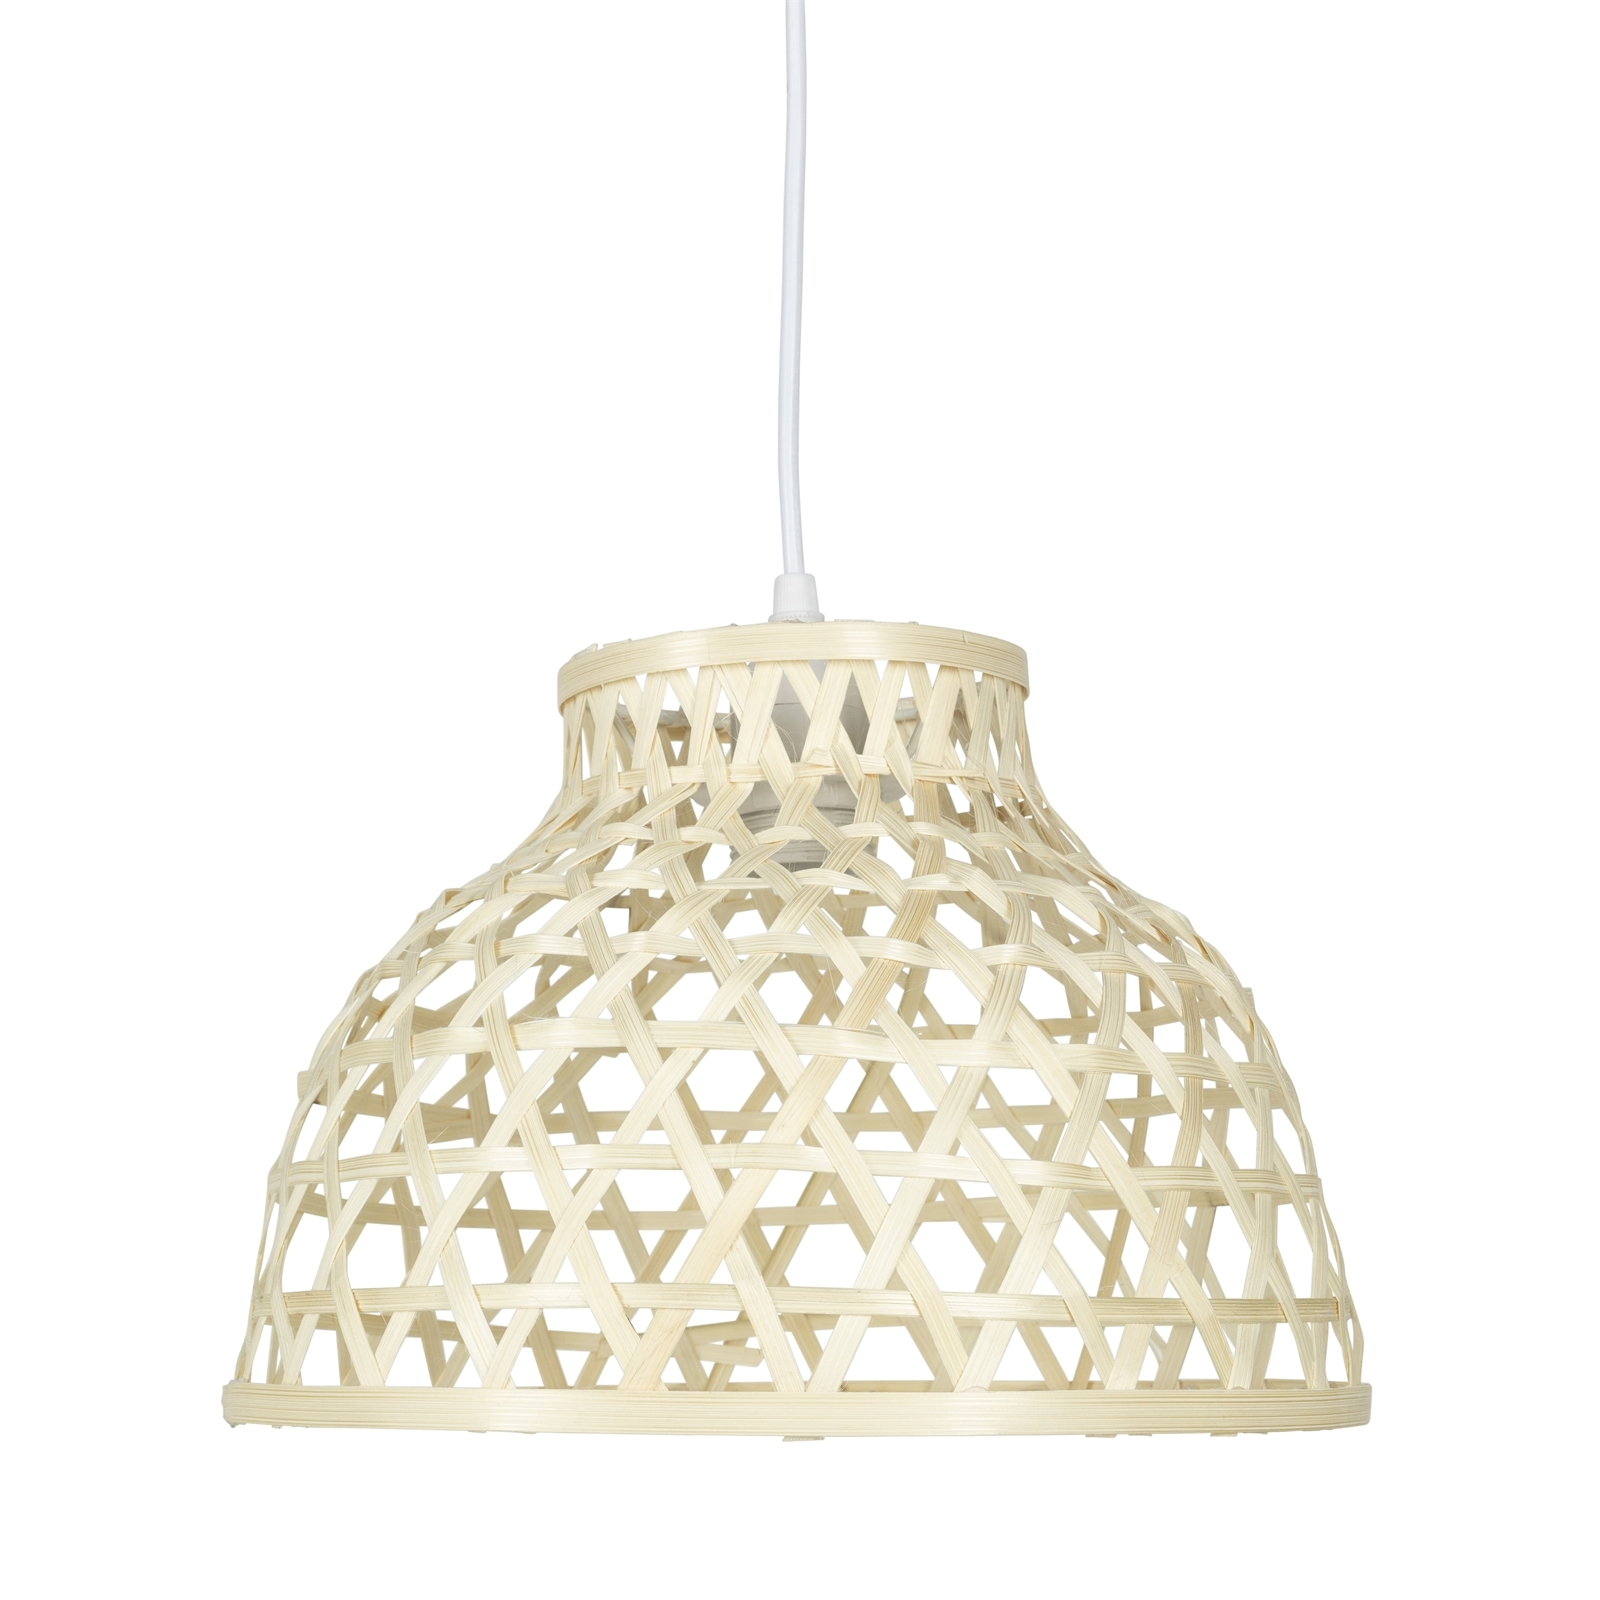 Brilliant 30cm Bamboo Moana Plug-In Natural Pendant DIY Light